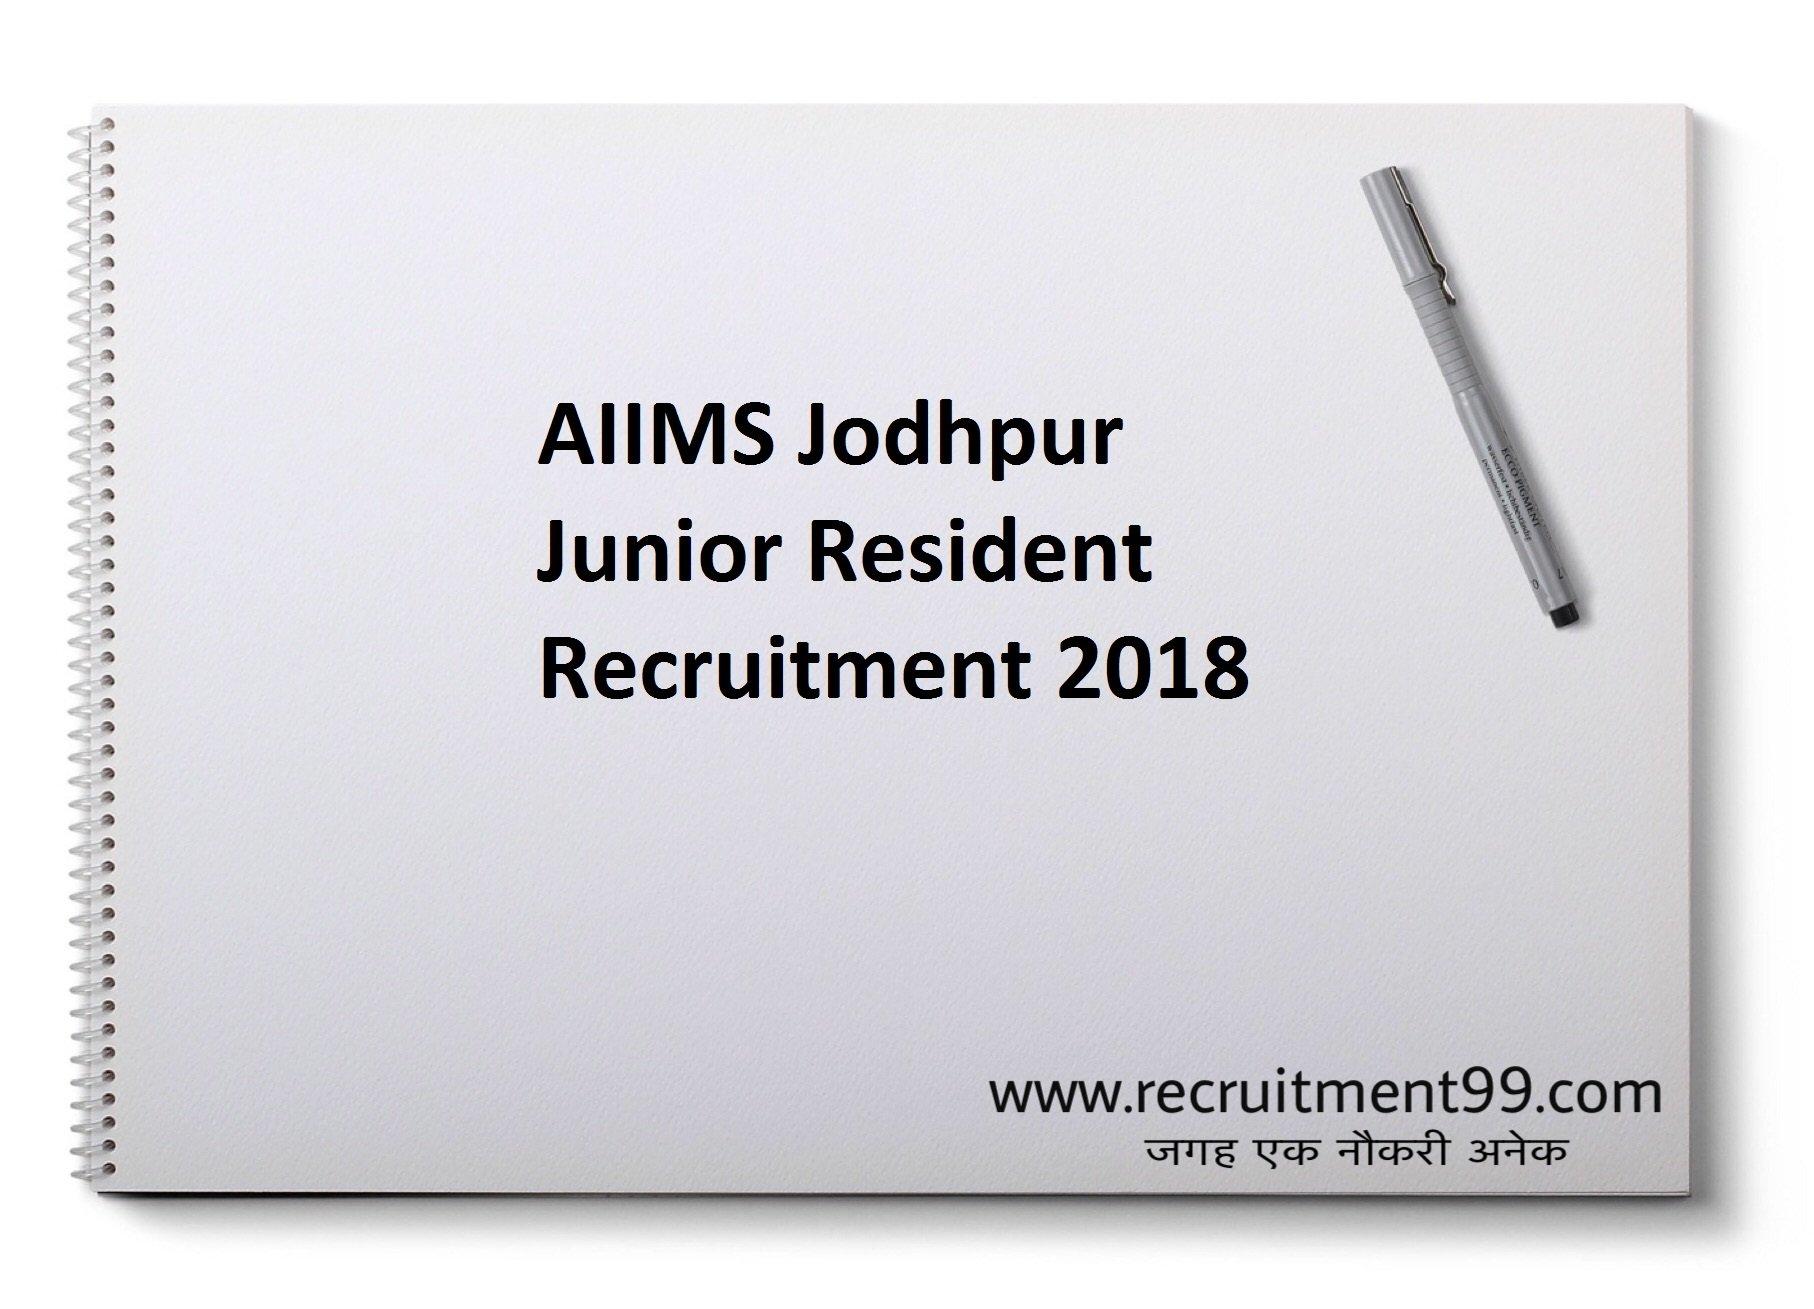 AIIMS Jodhpur Junior Resident Recruitment Admit Card Result 2018